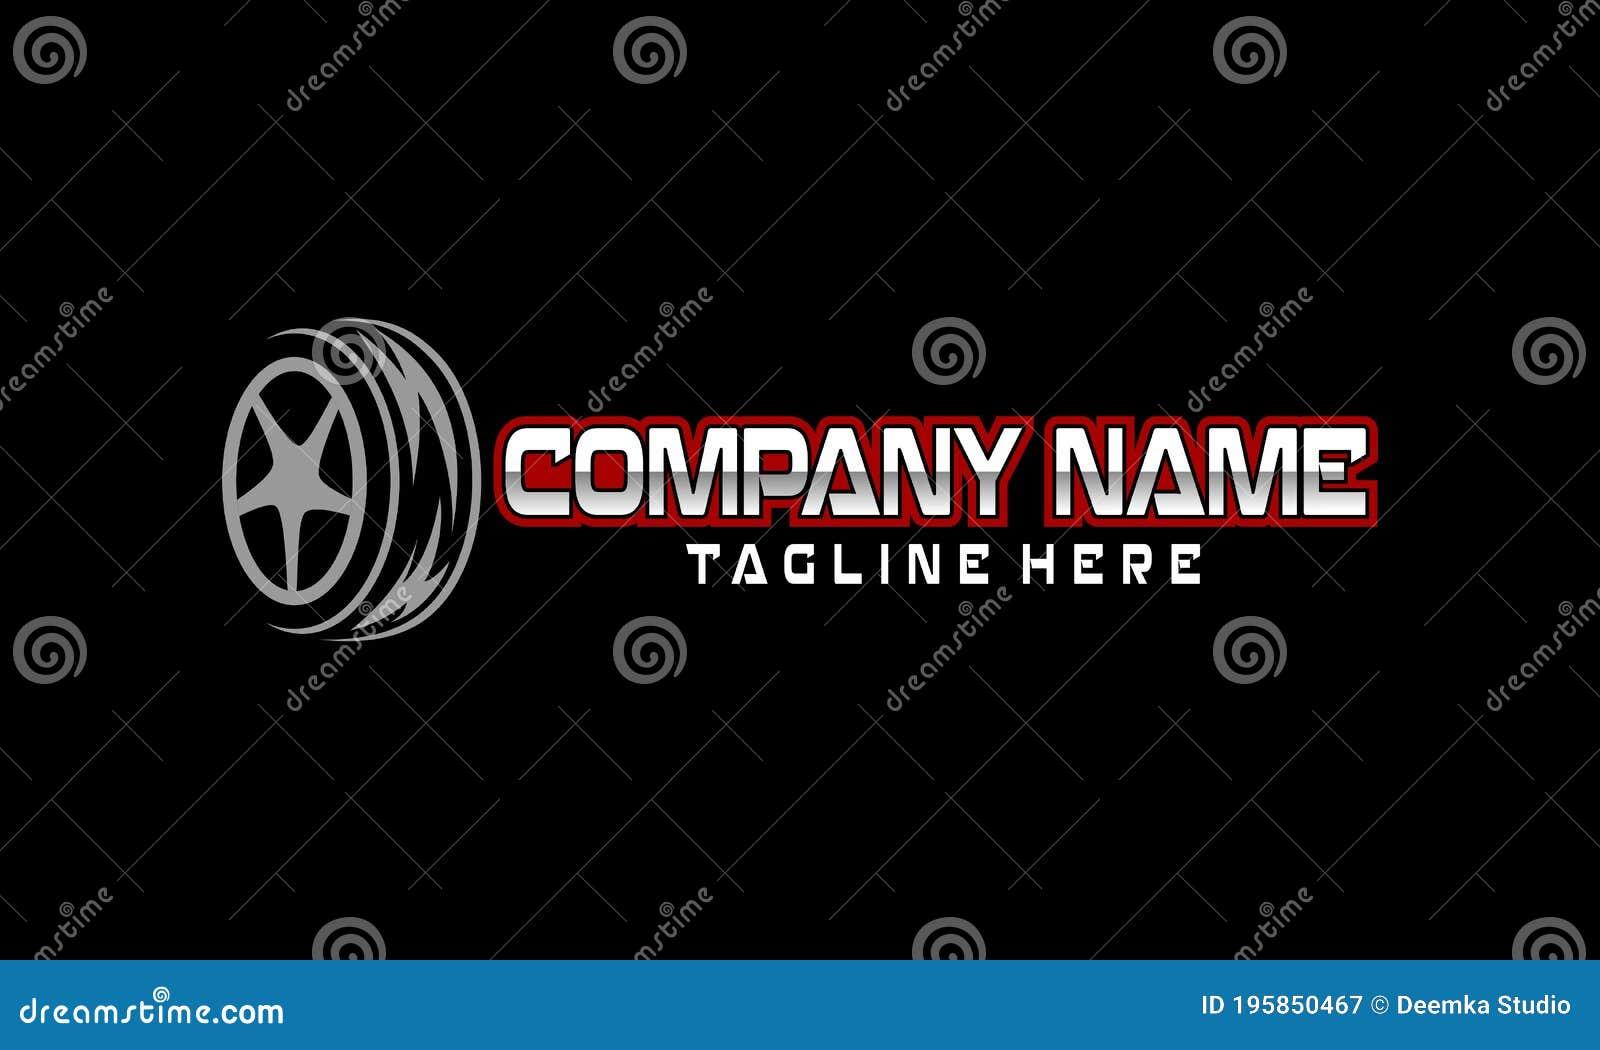 Auto Repair Services Automotive Logo Ideas Sample Vehicle Logos Stock Illustration Illustration Of Automobile Idea 195850467